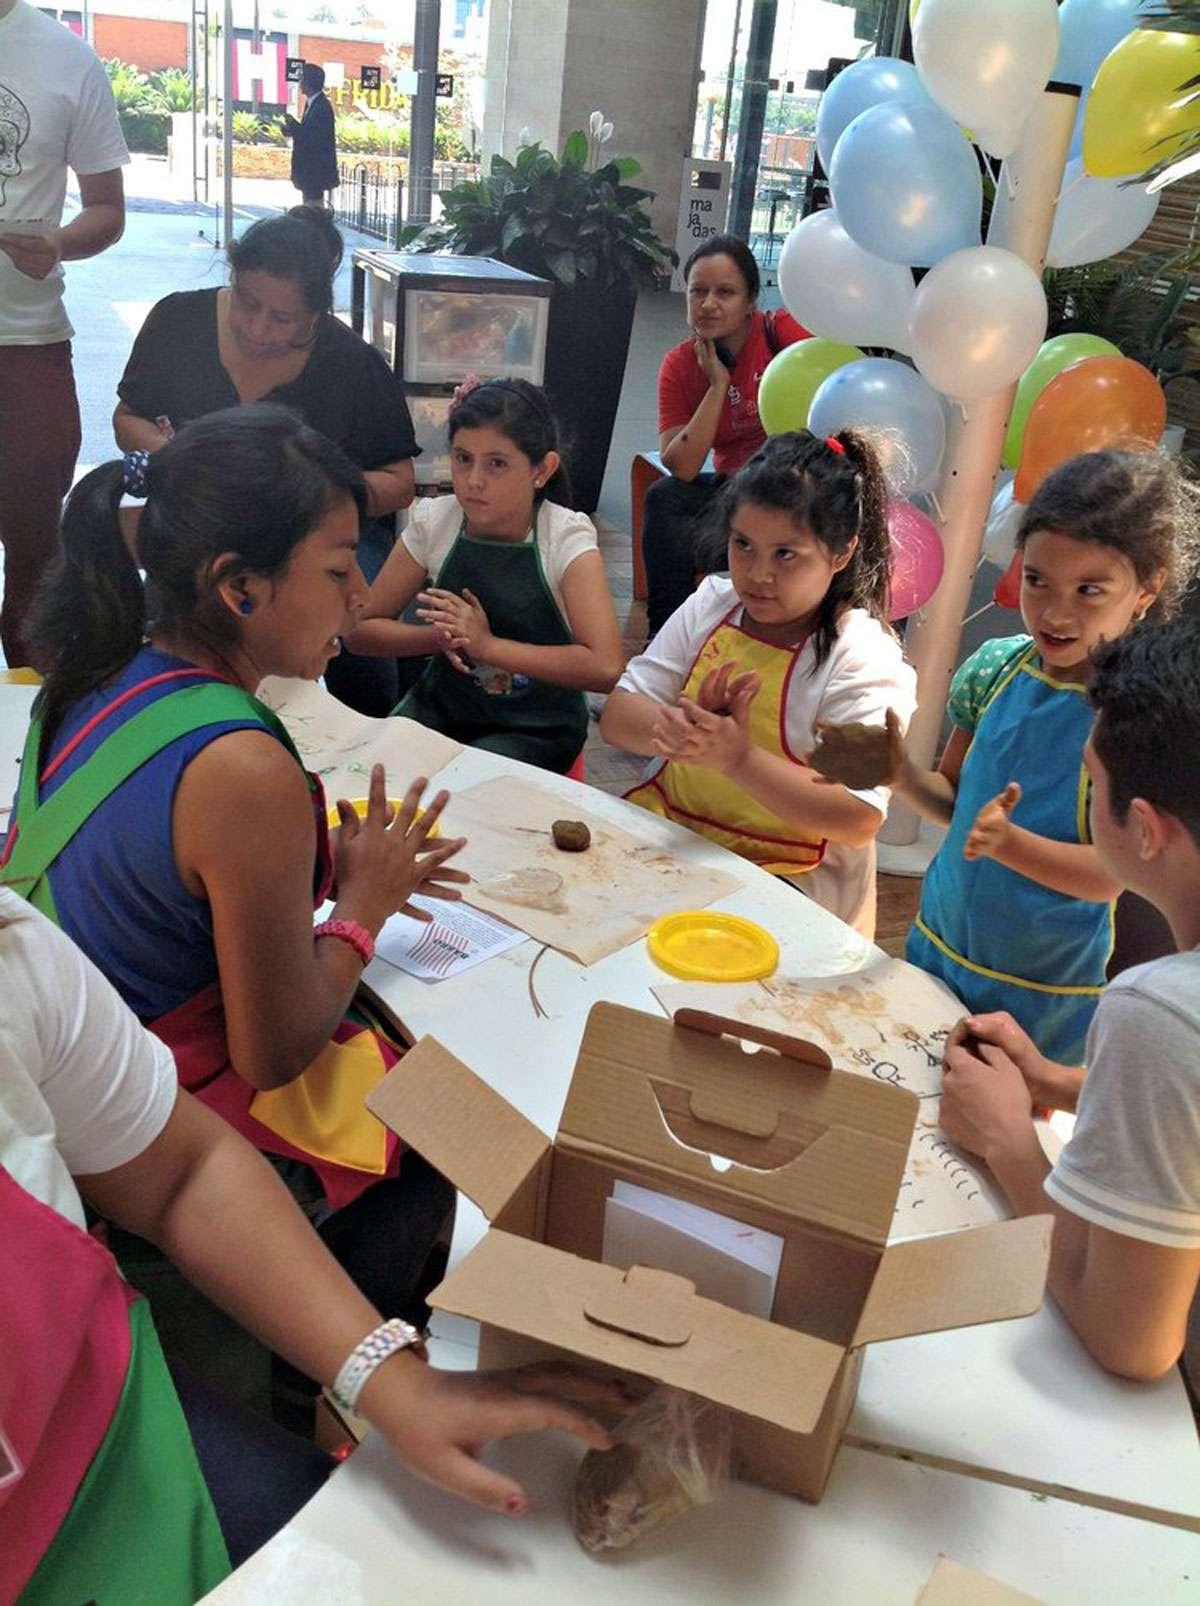 Children in DIDART's workshop with clay pots. Photo: Meg Pier